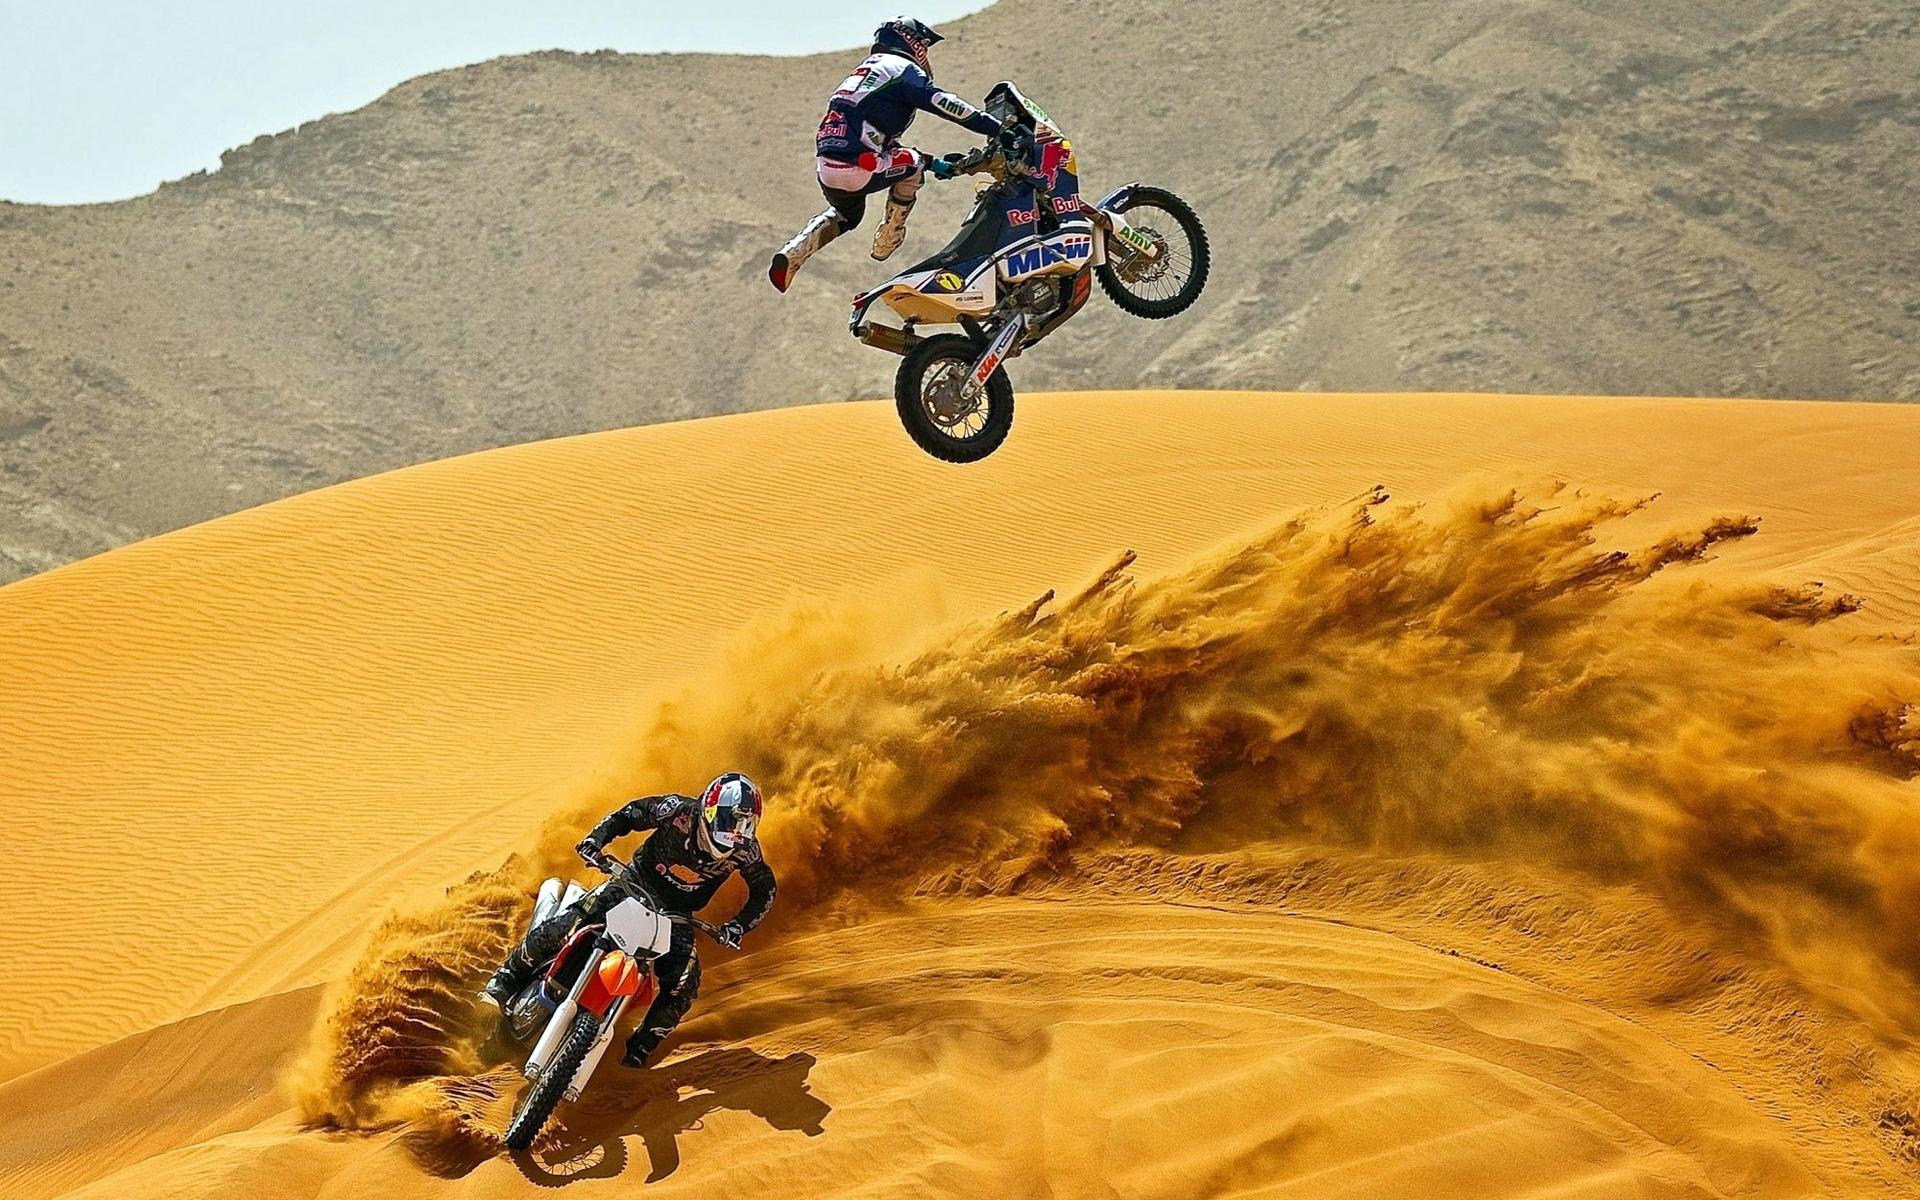 22178 descargar fondo de pantalla Deportes, Transporte, Personas, Motocicletas, Desierto, Motocross: protectores de pantalla e imágenes gratis